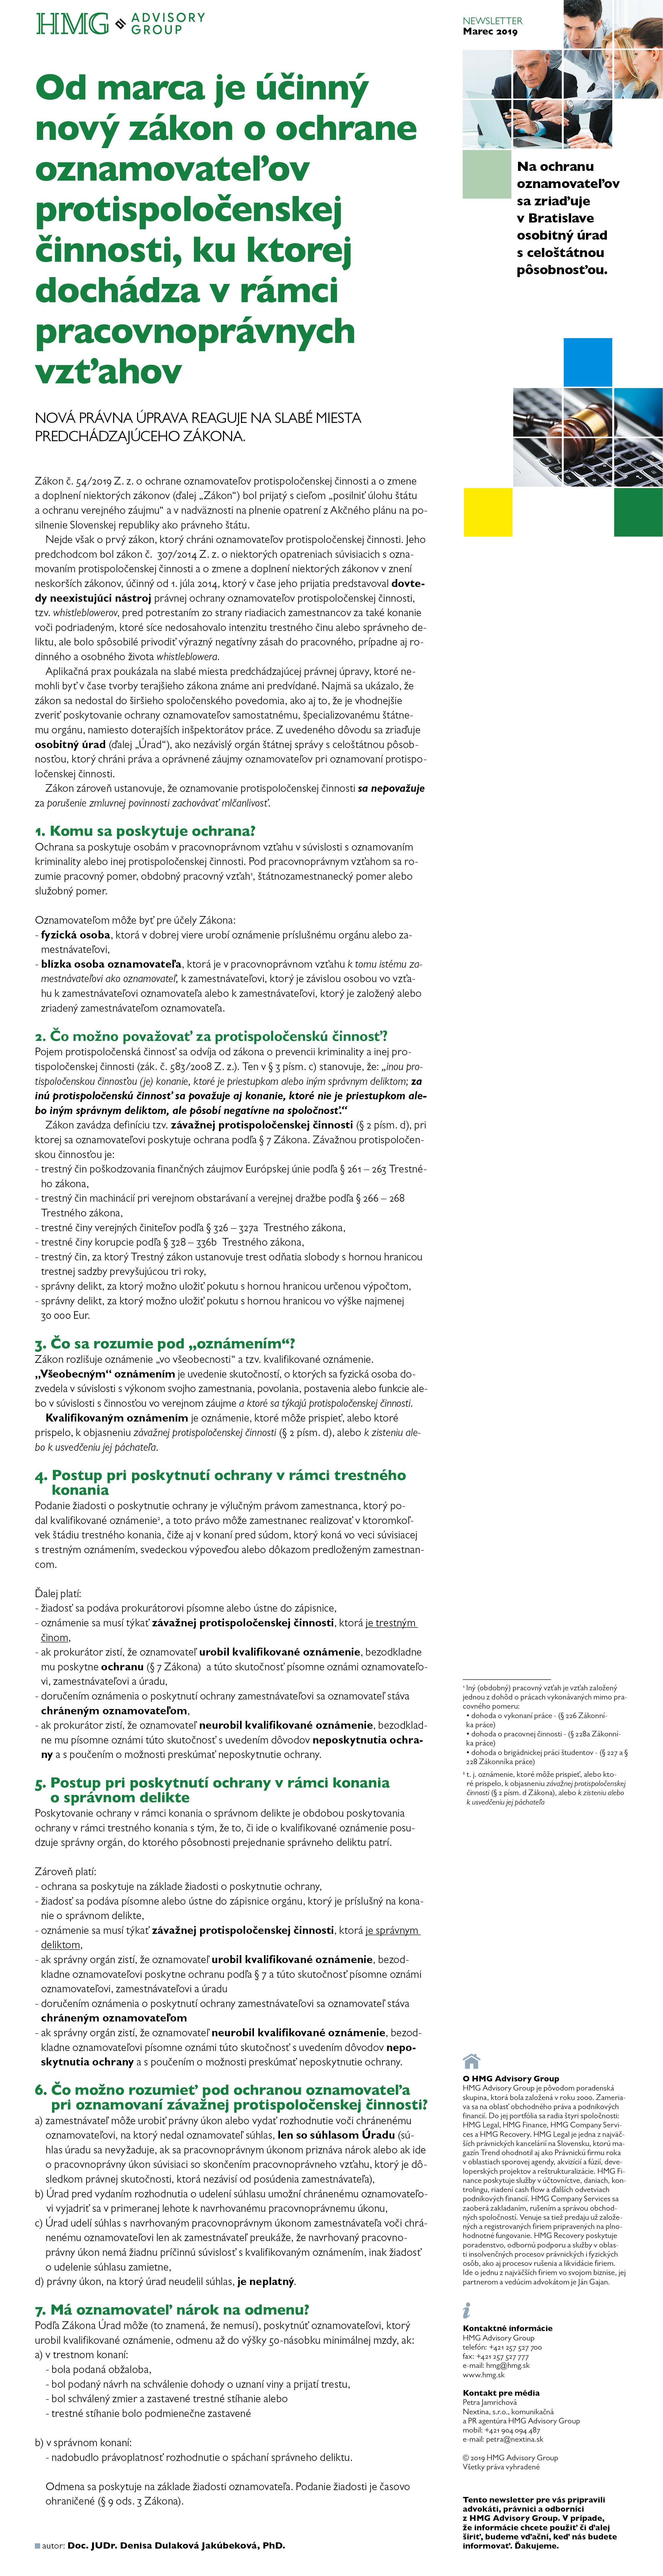 HMG_newsletter_ochrana oznamovatela_oprava.jpg